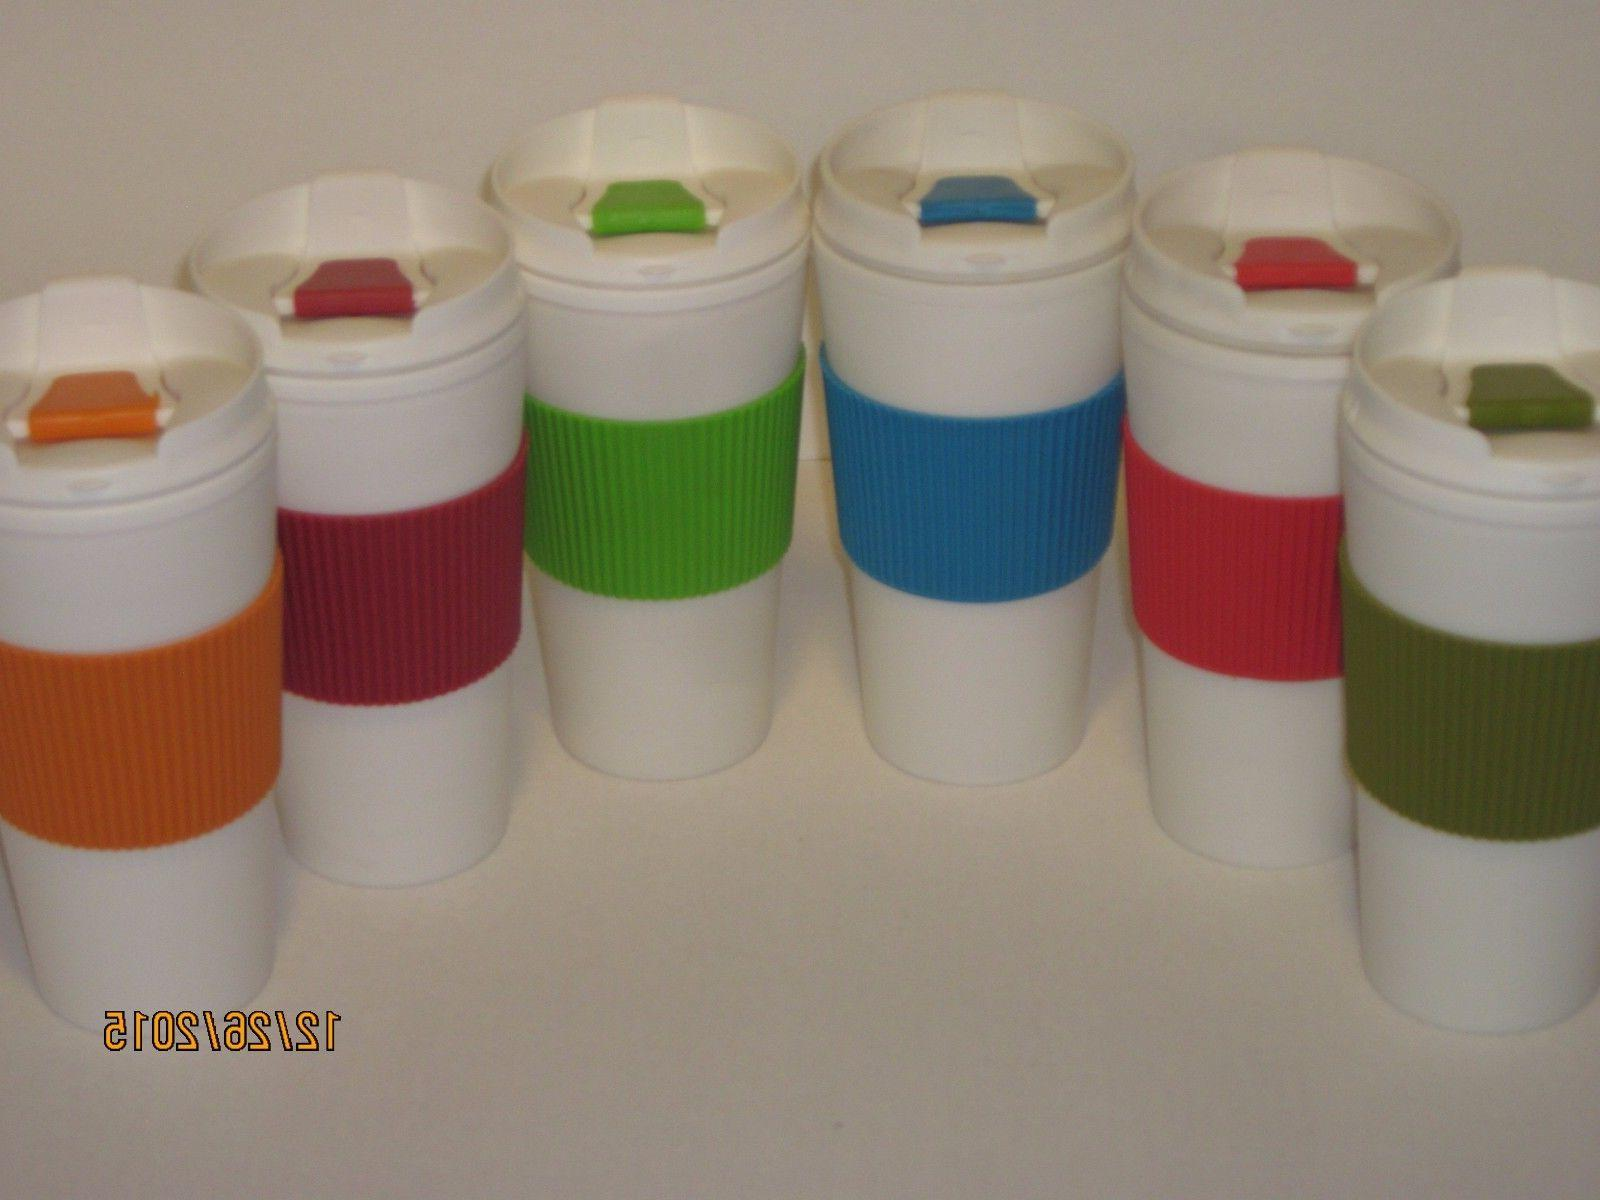 Thermal 16oz Mug - Car, Go, Coffee Thermos,